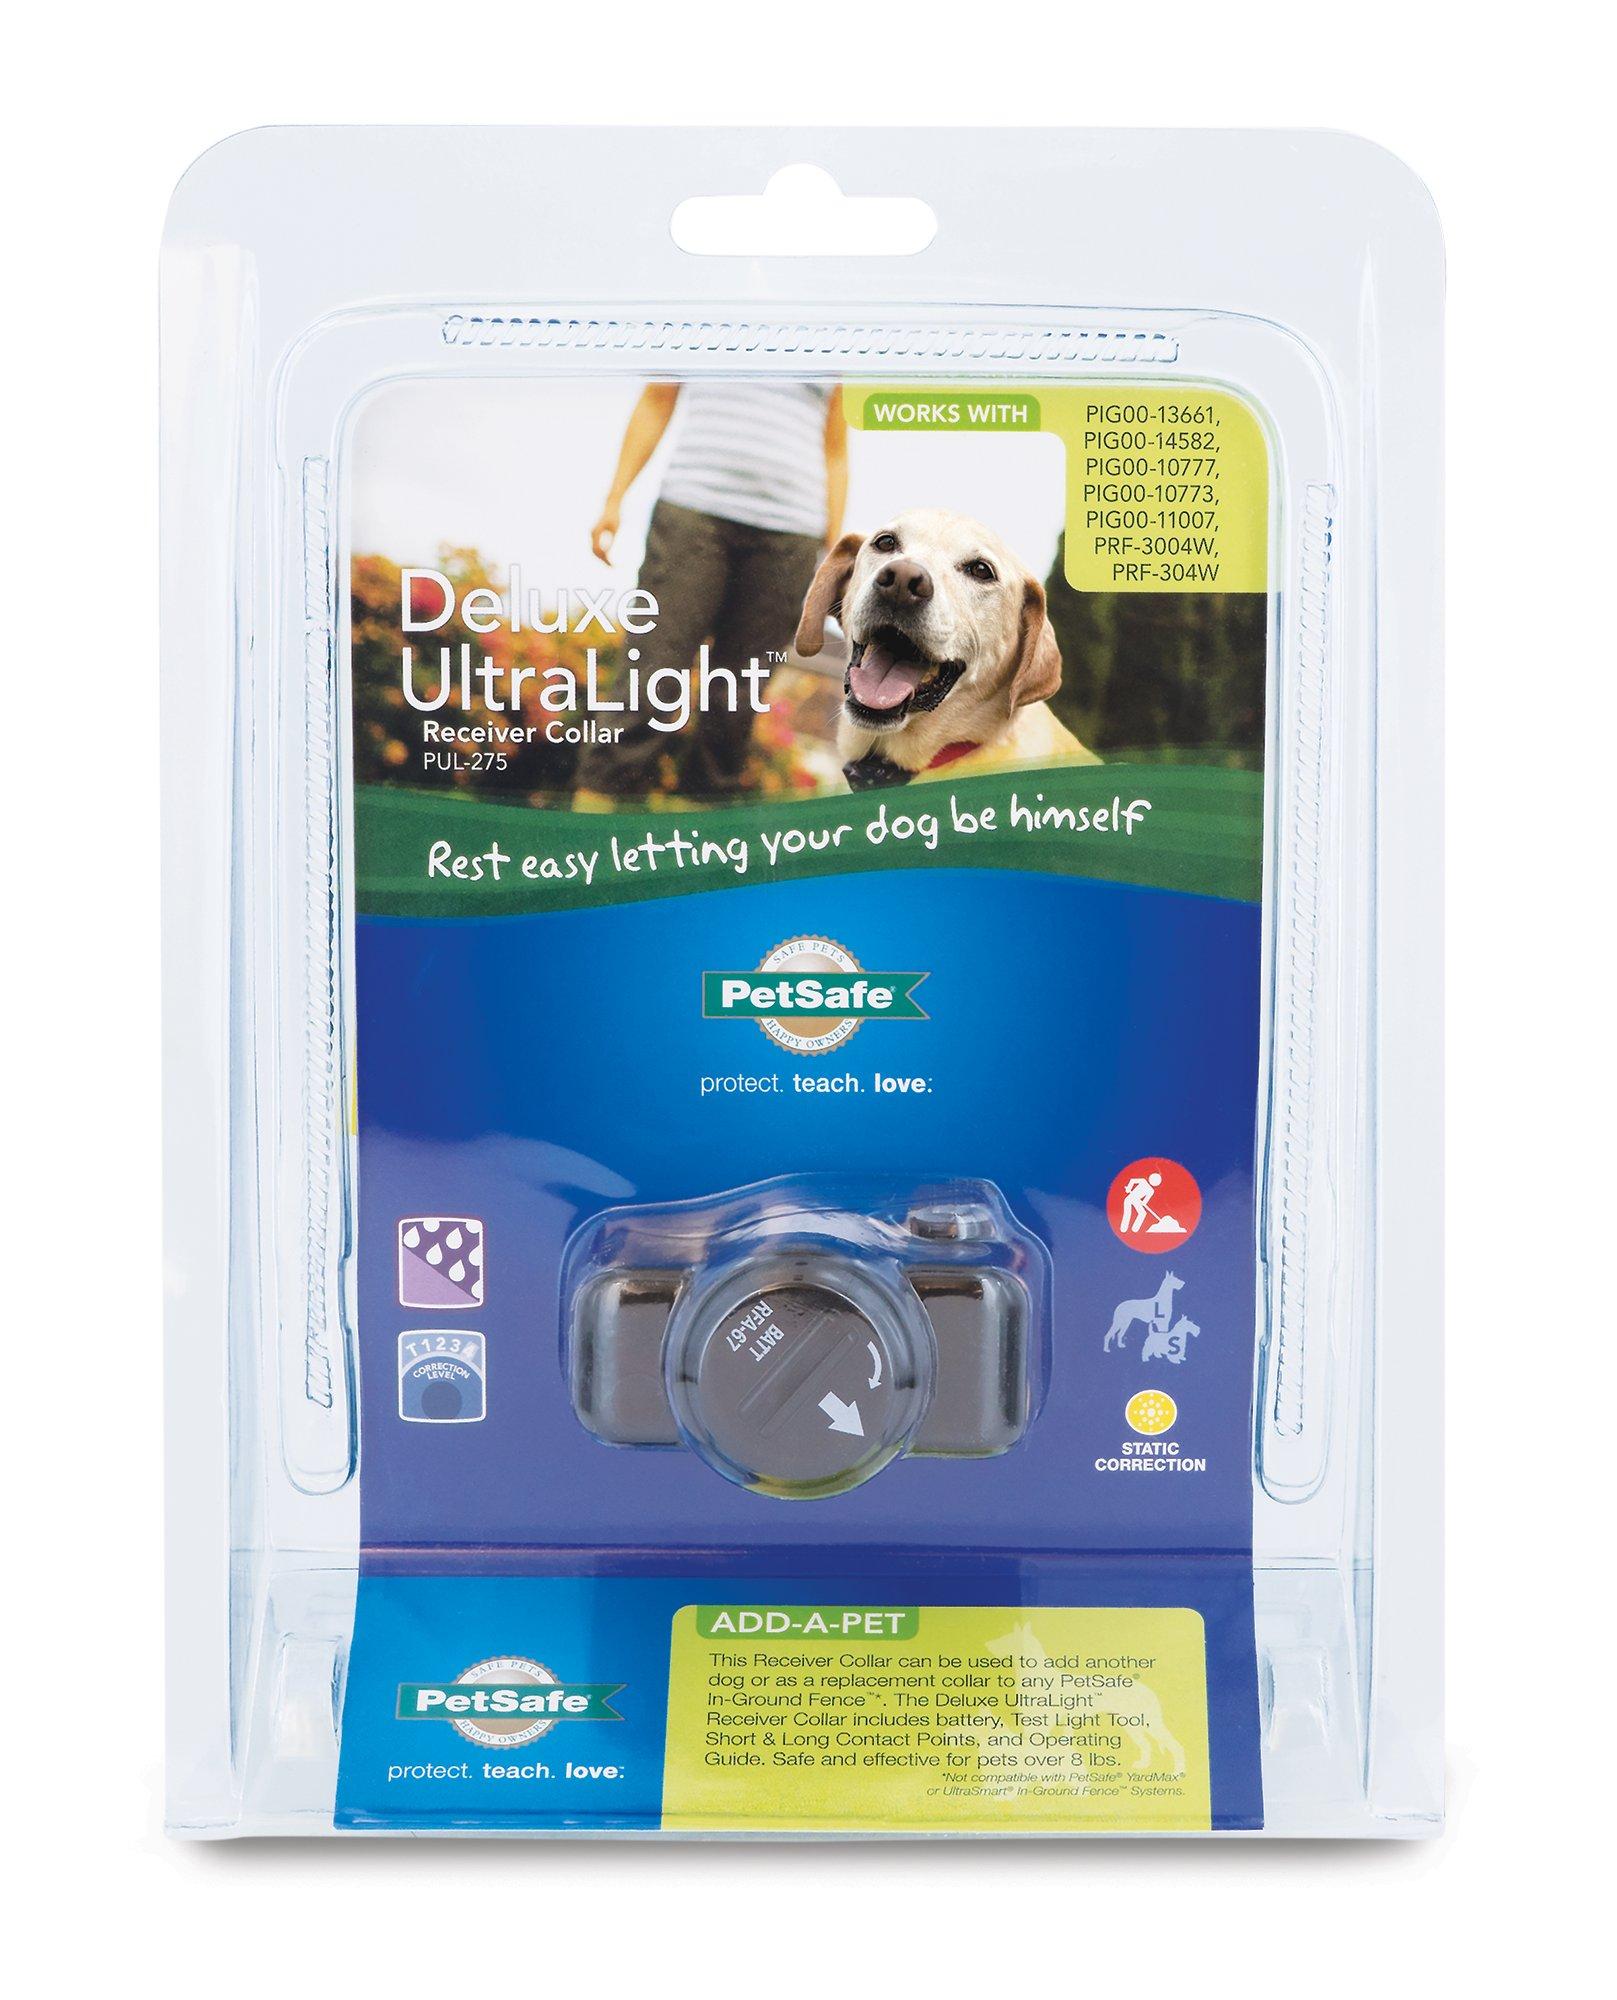 PetSafe Deluxe InGround UltraLight Receiver Collar Dog